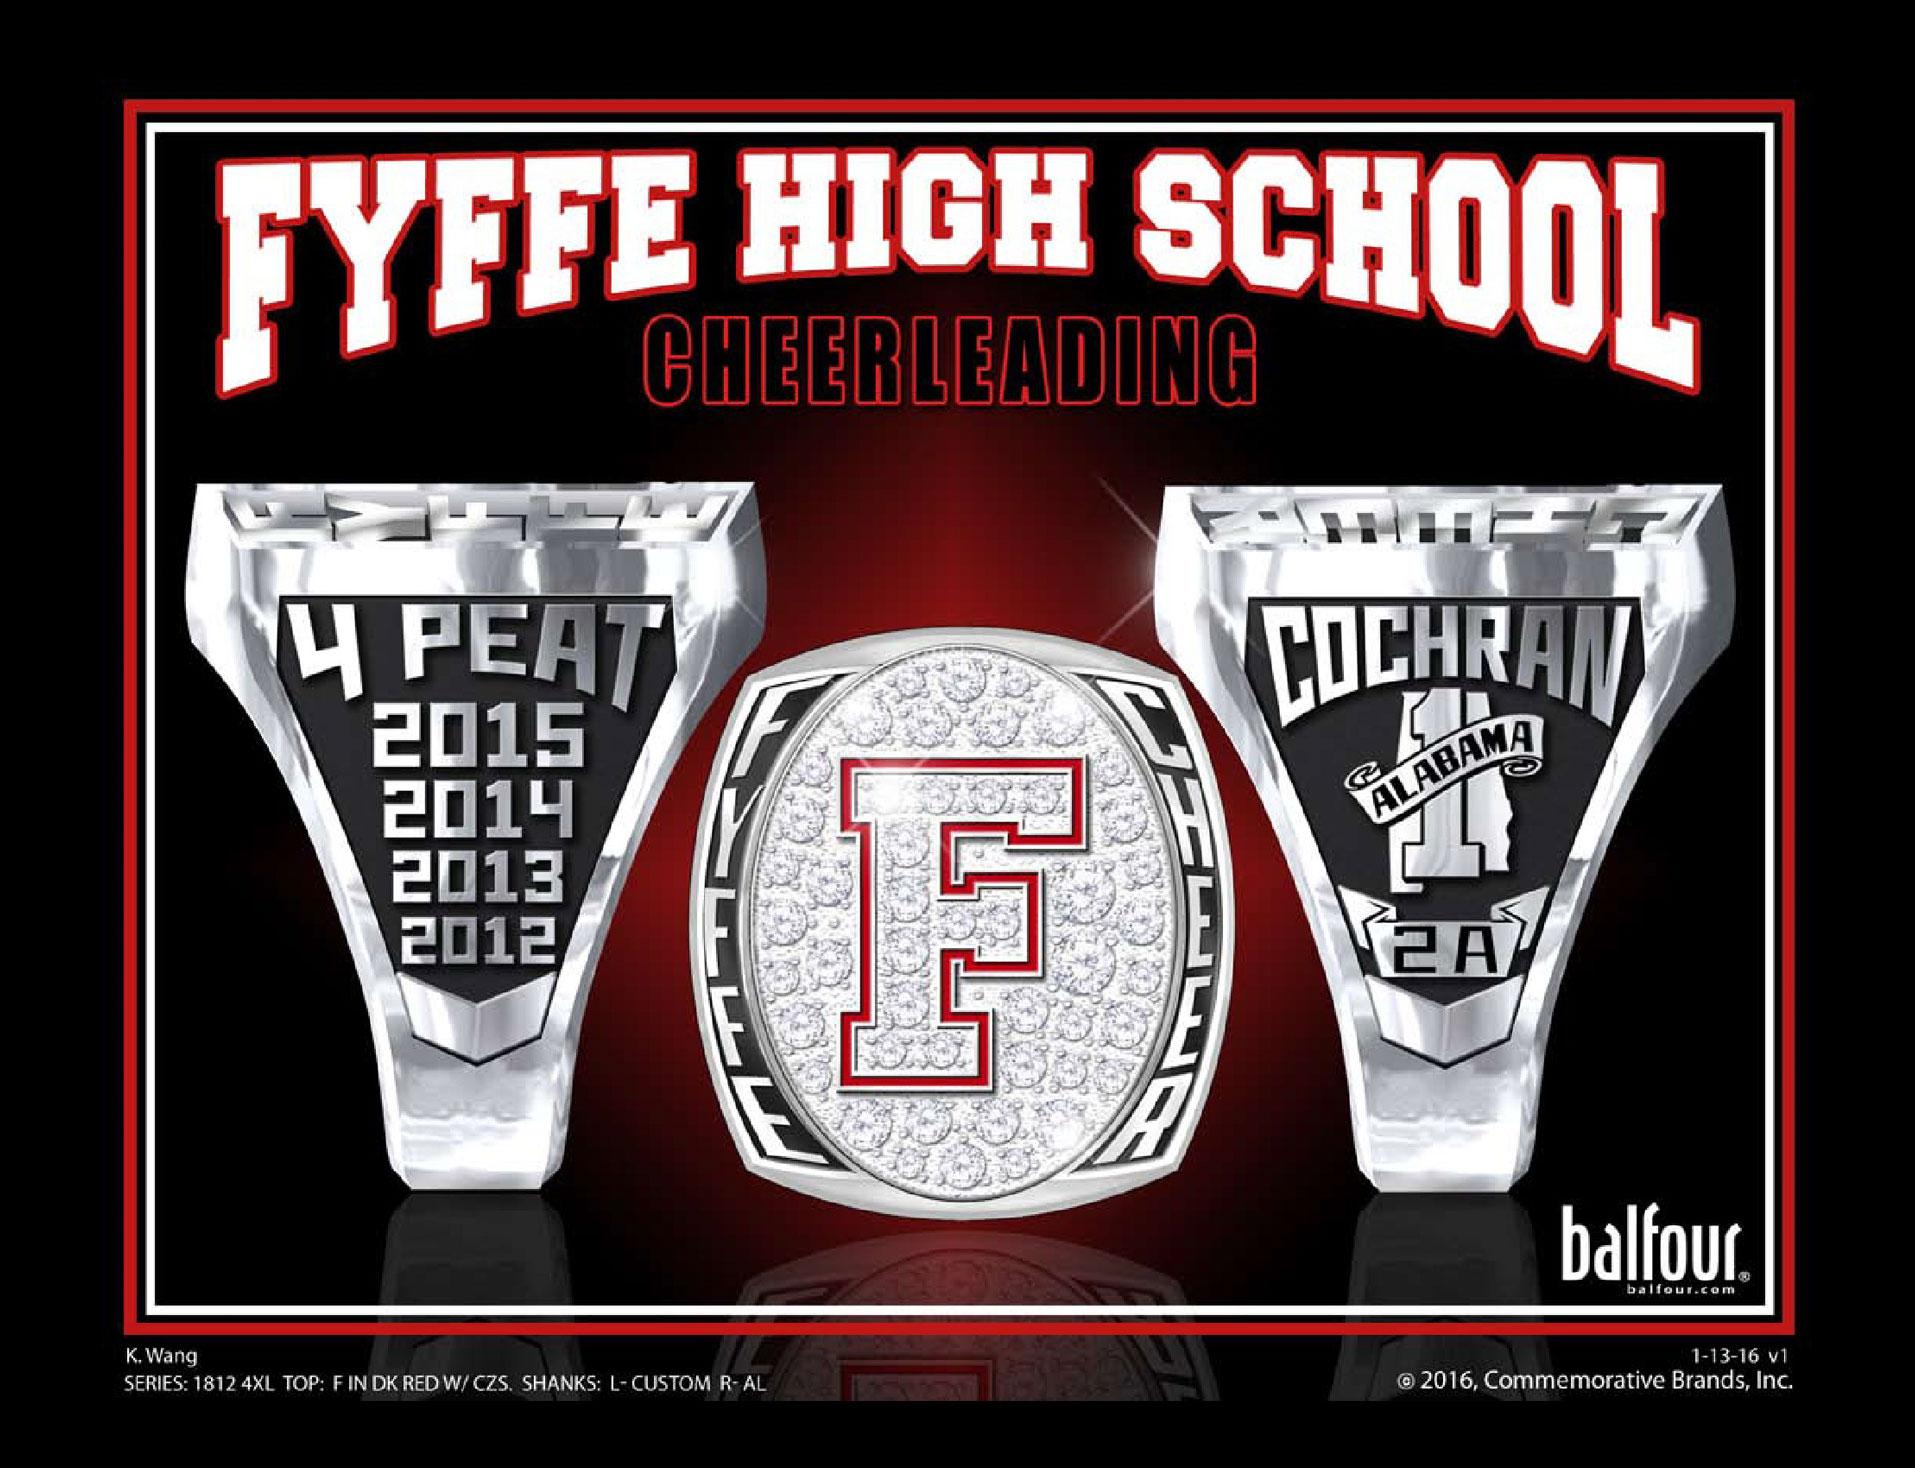 Fyffe cheerleading high school championship rings